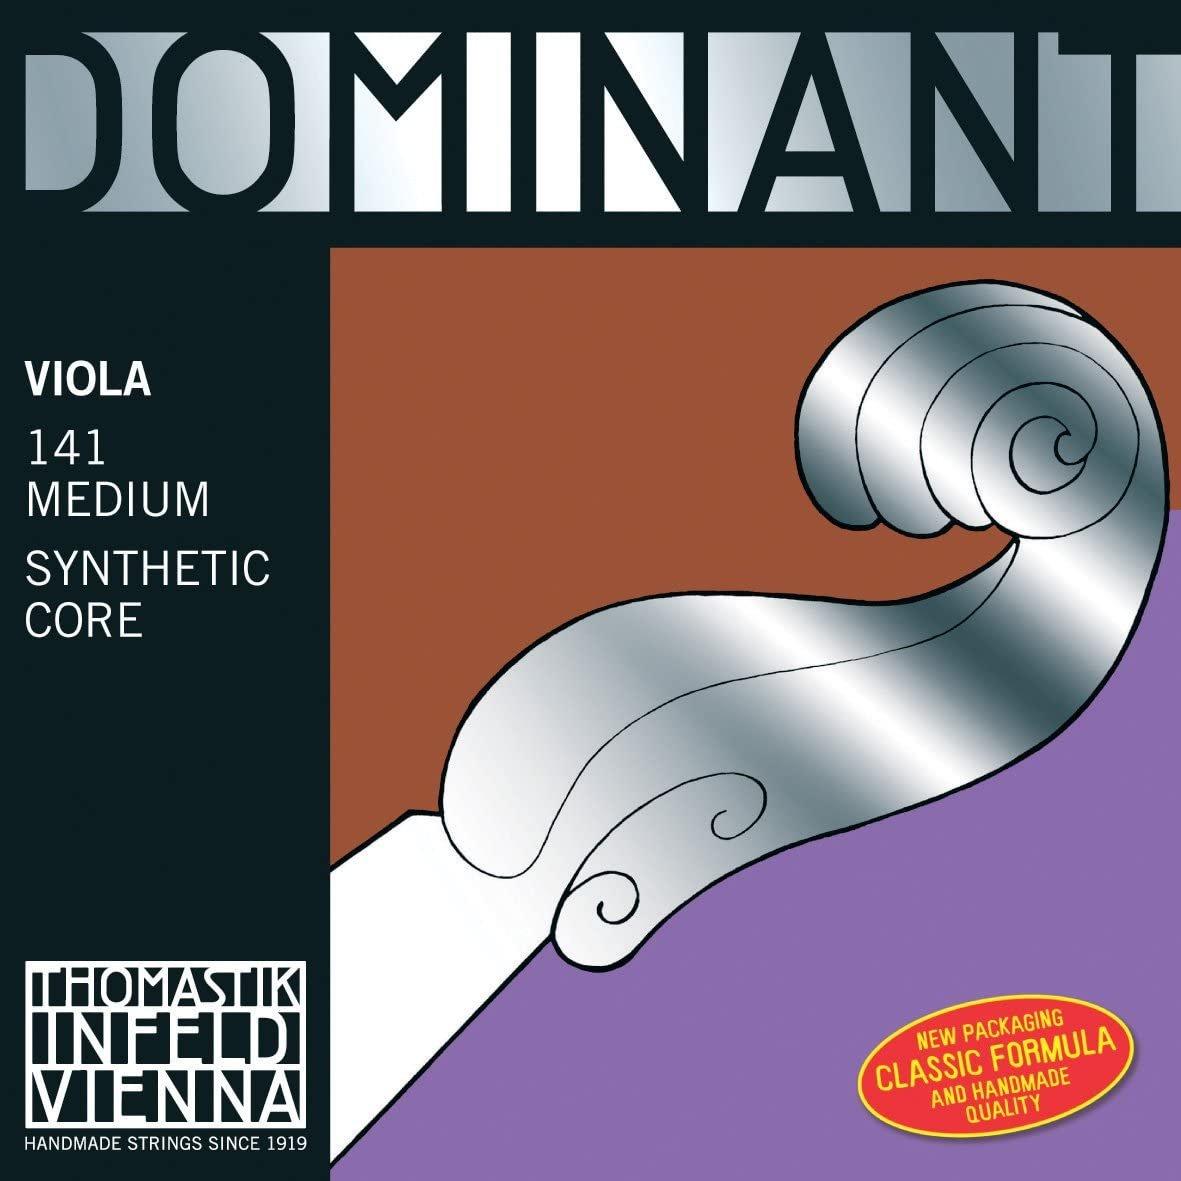 Thomastik Viola Strings Set Med Tension